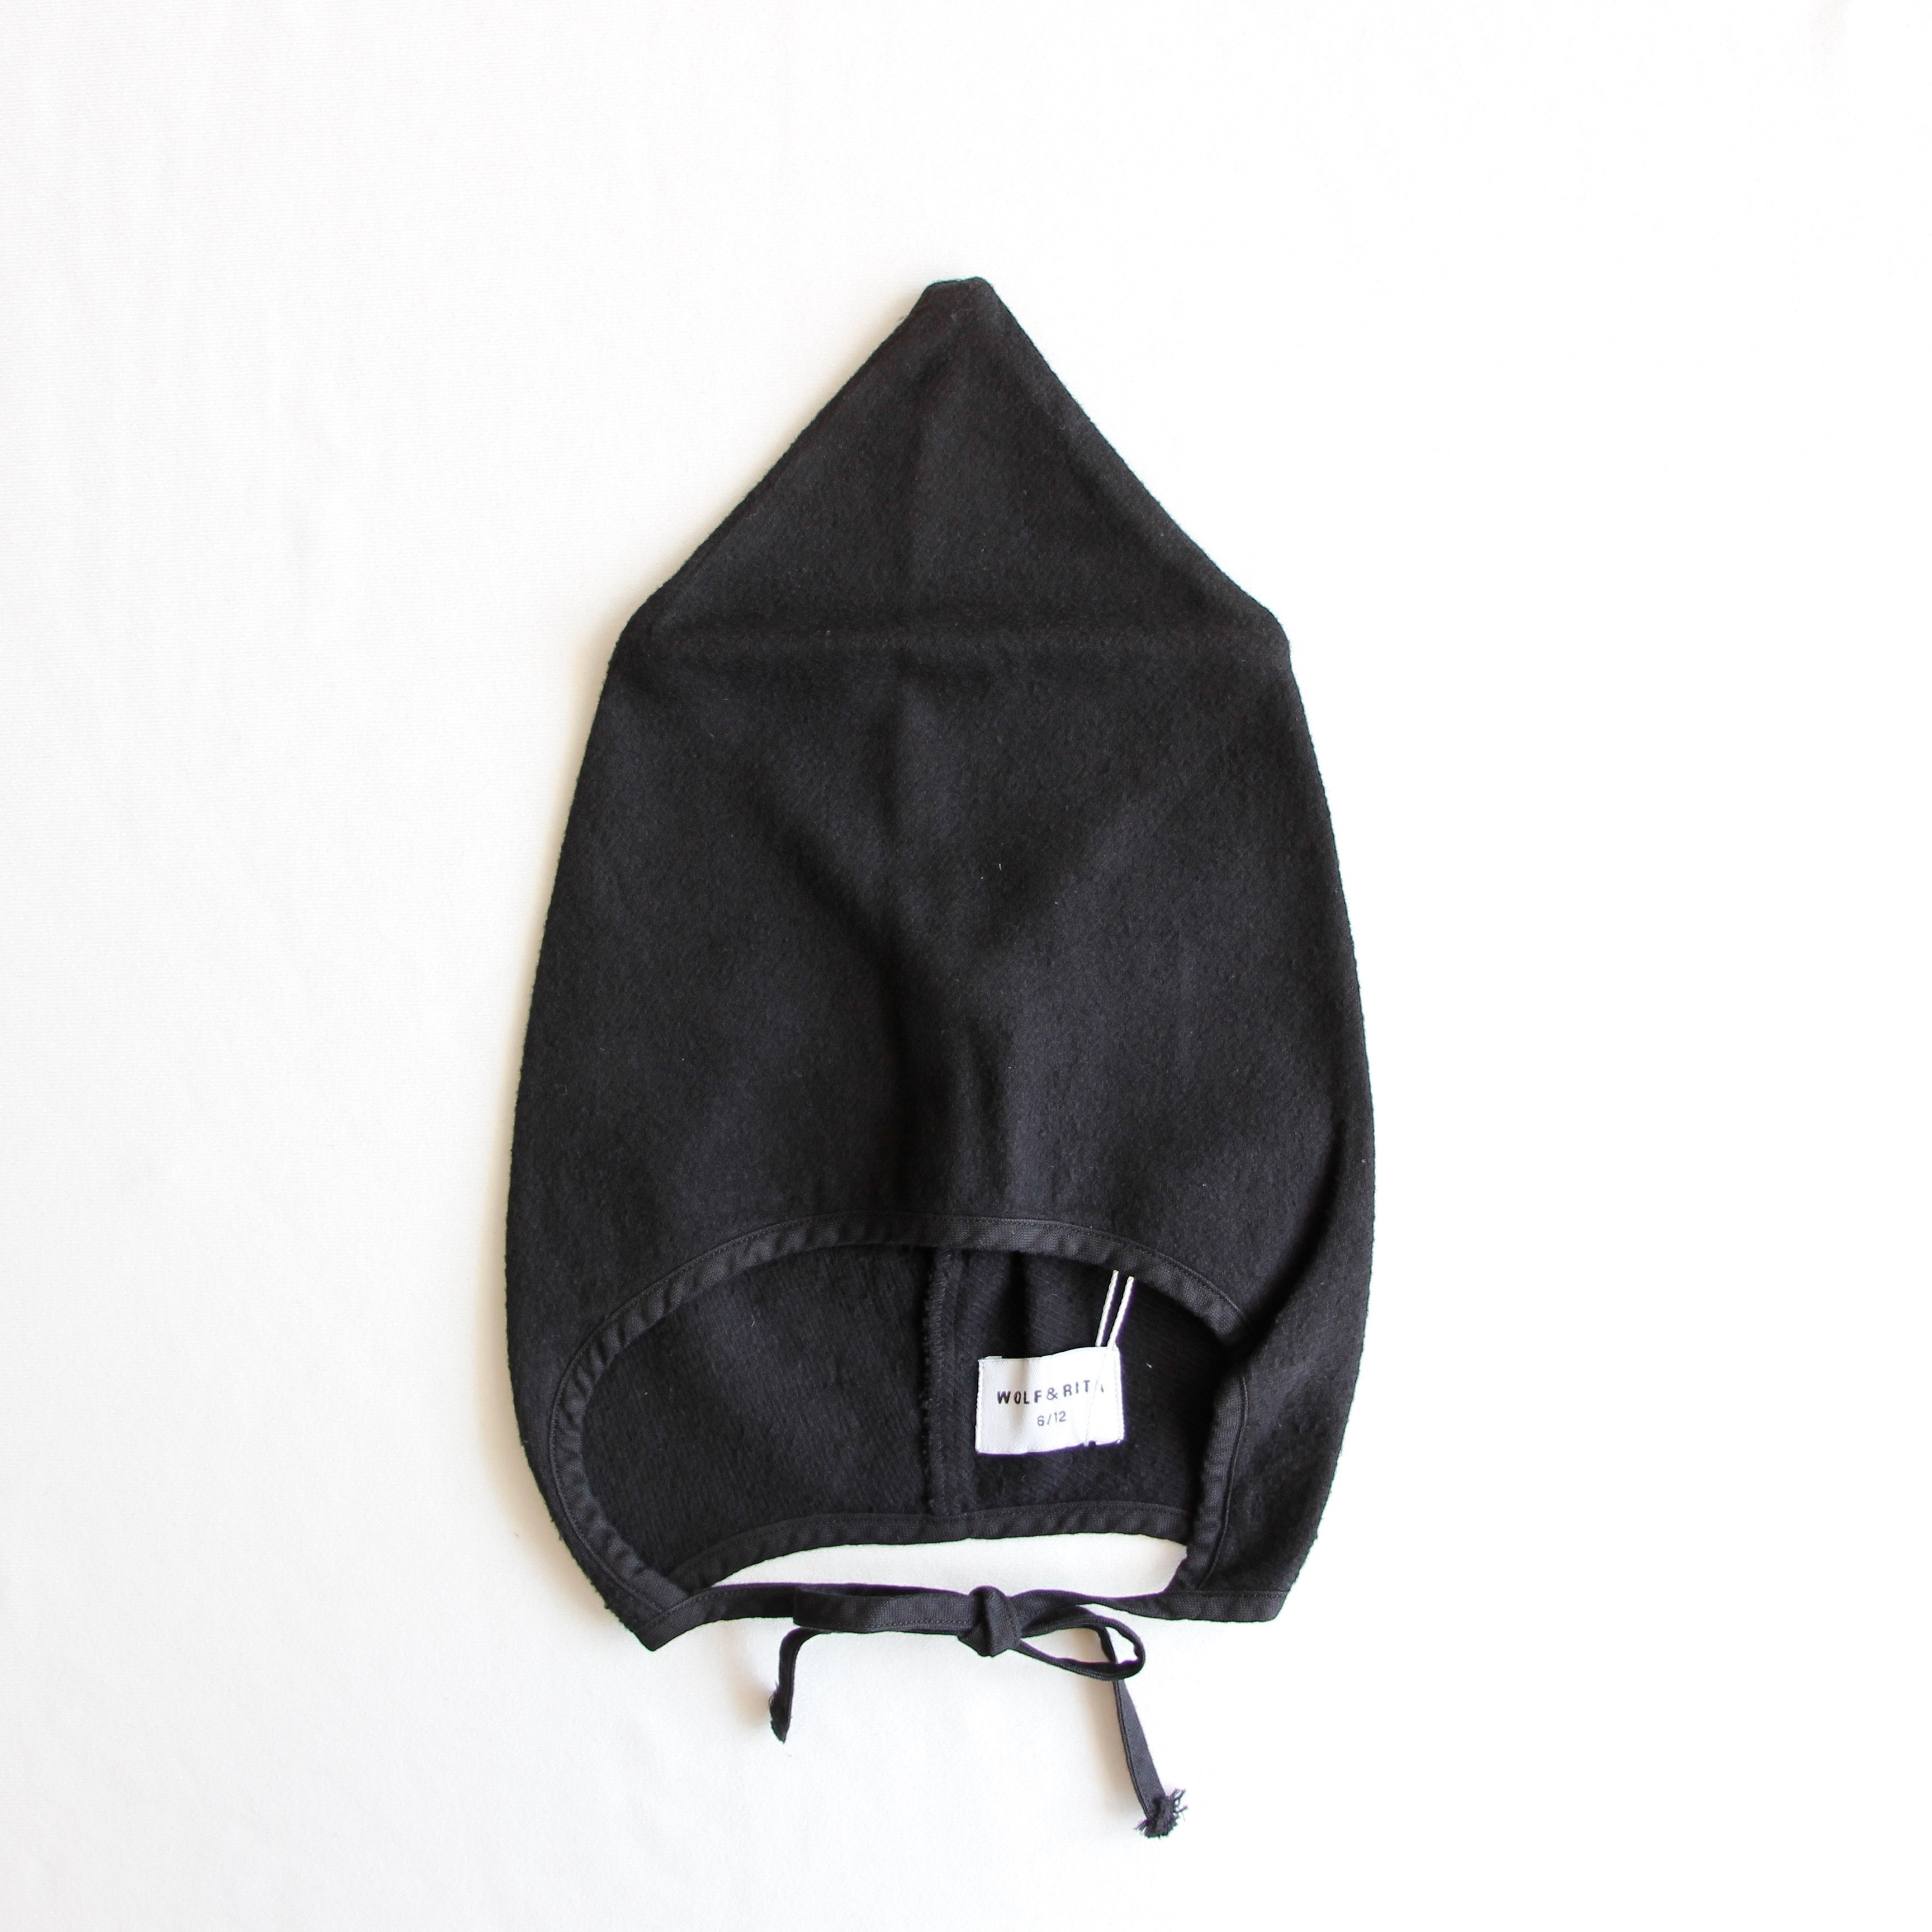 《WOLF & RITA 2018AW》ELDA hat / black